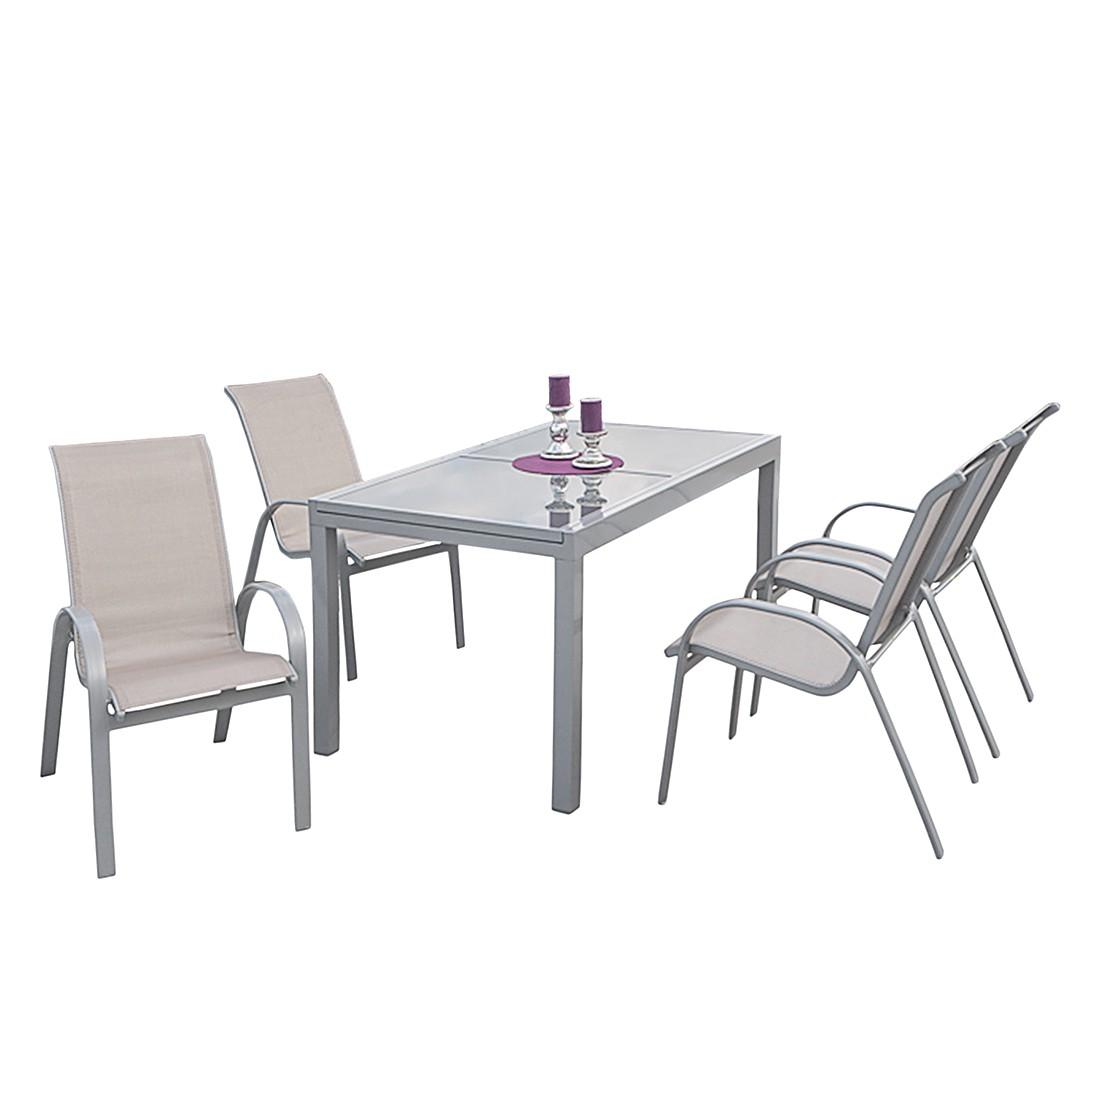 Gartensitzgruppe Amalfi I (5-teilig) – Aluminuim Silber/Kunstfasergewebe Champagner, Merxx günstig bestellen